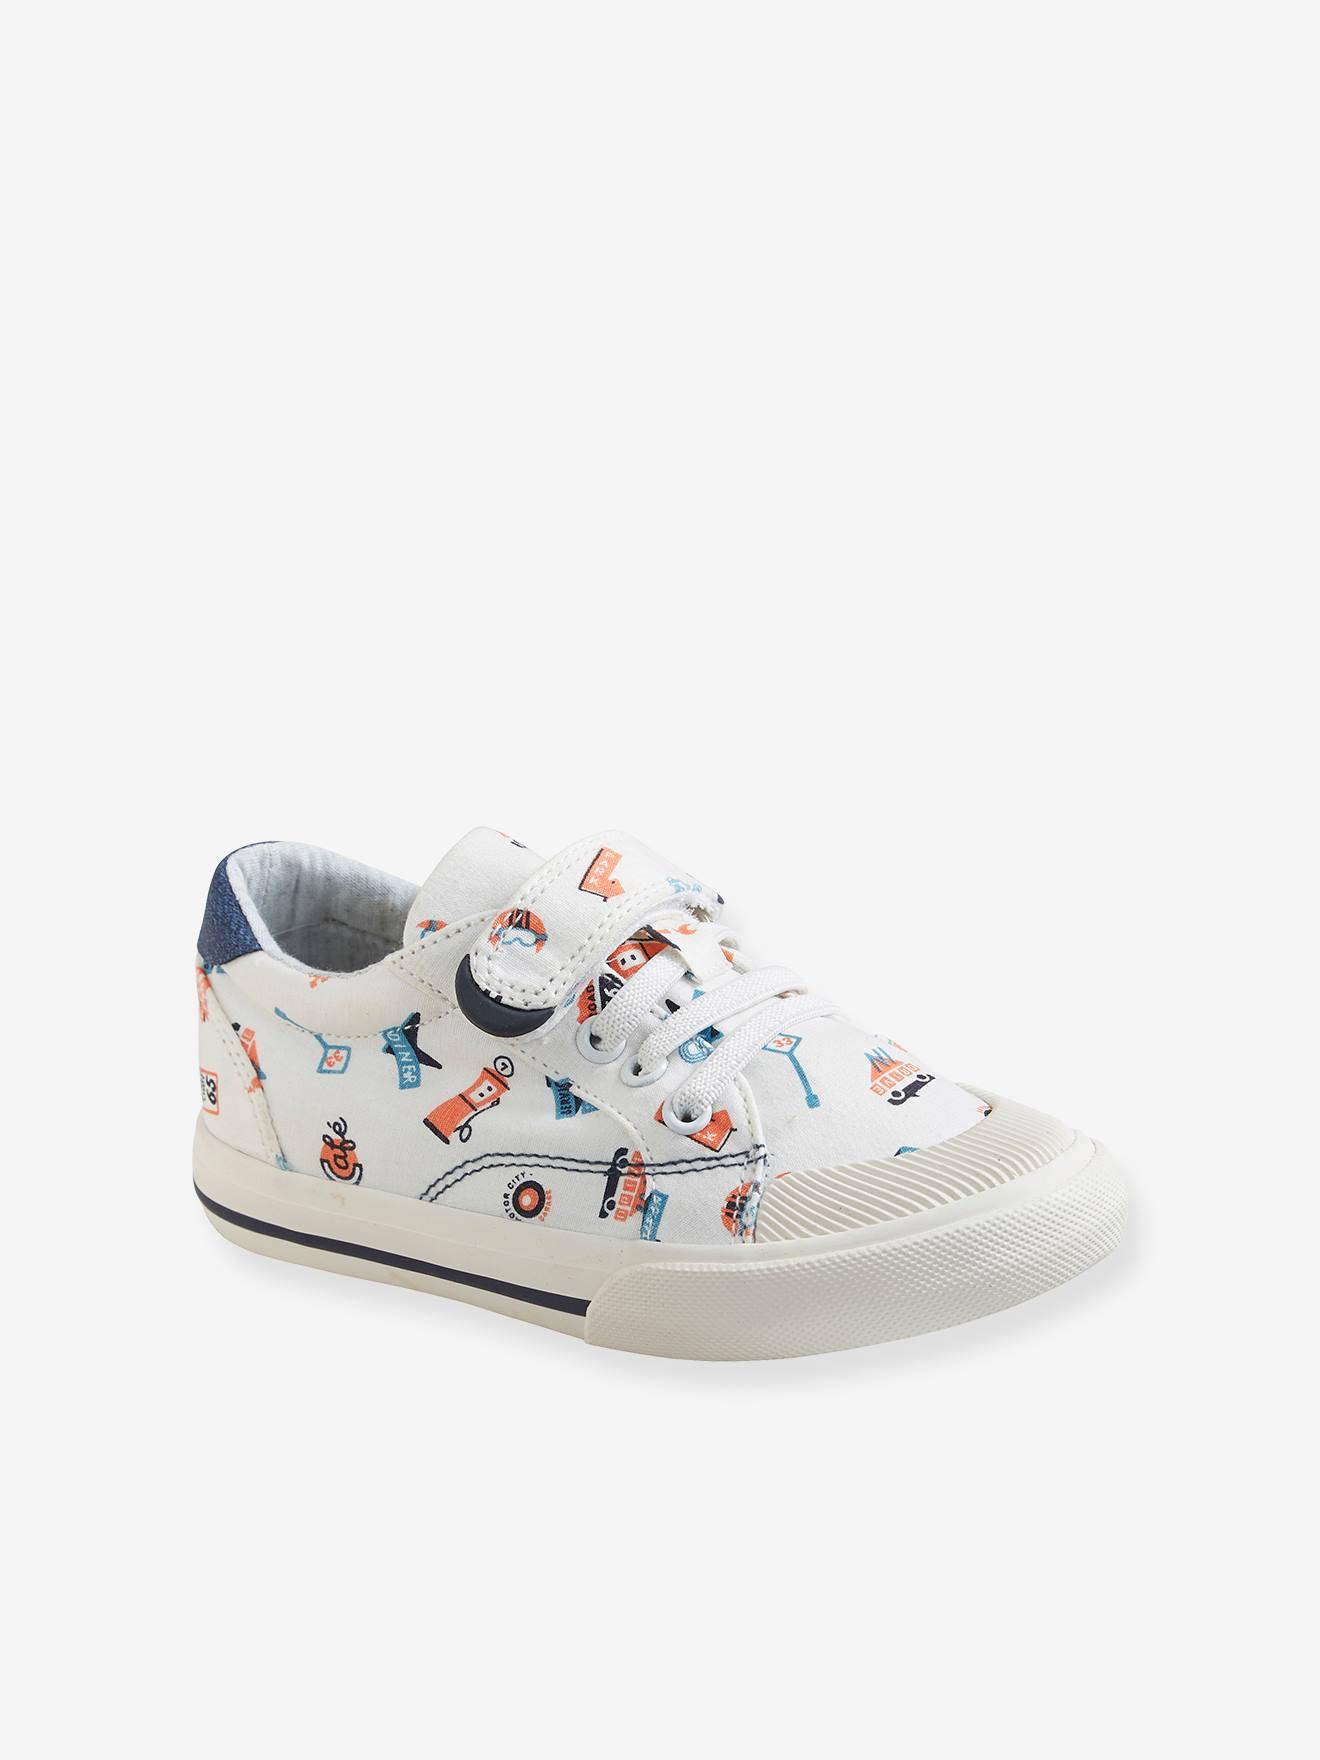 Baskets garçon collection maternelle blanc Vertbaudet